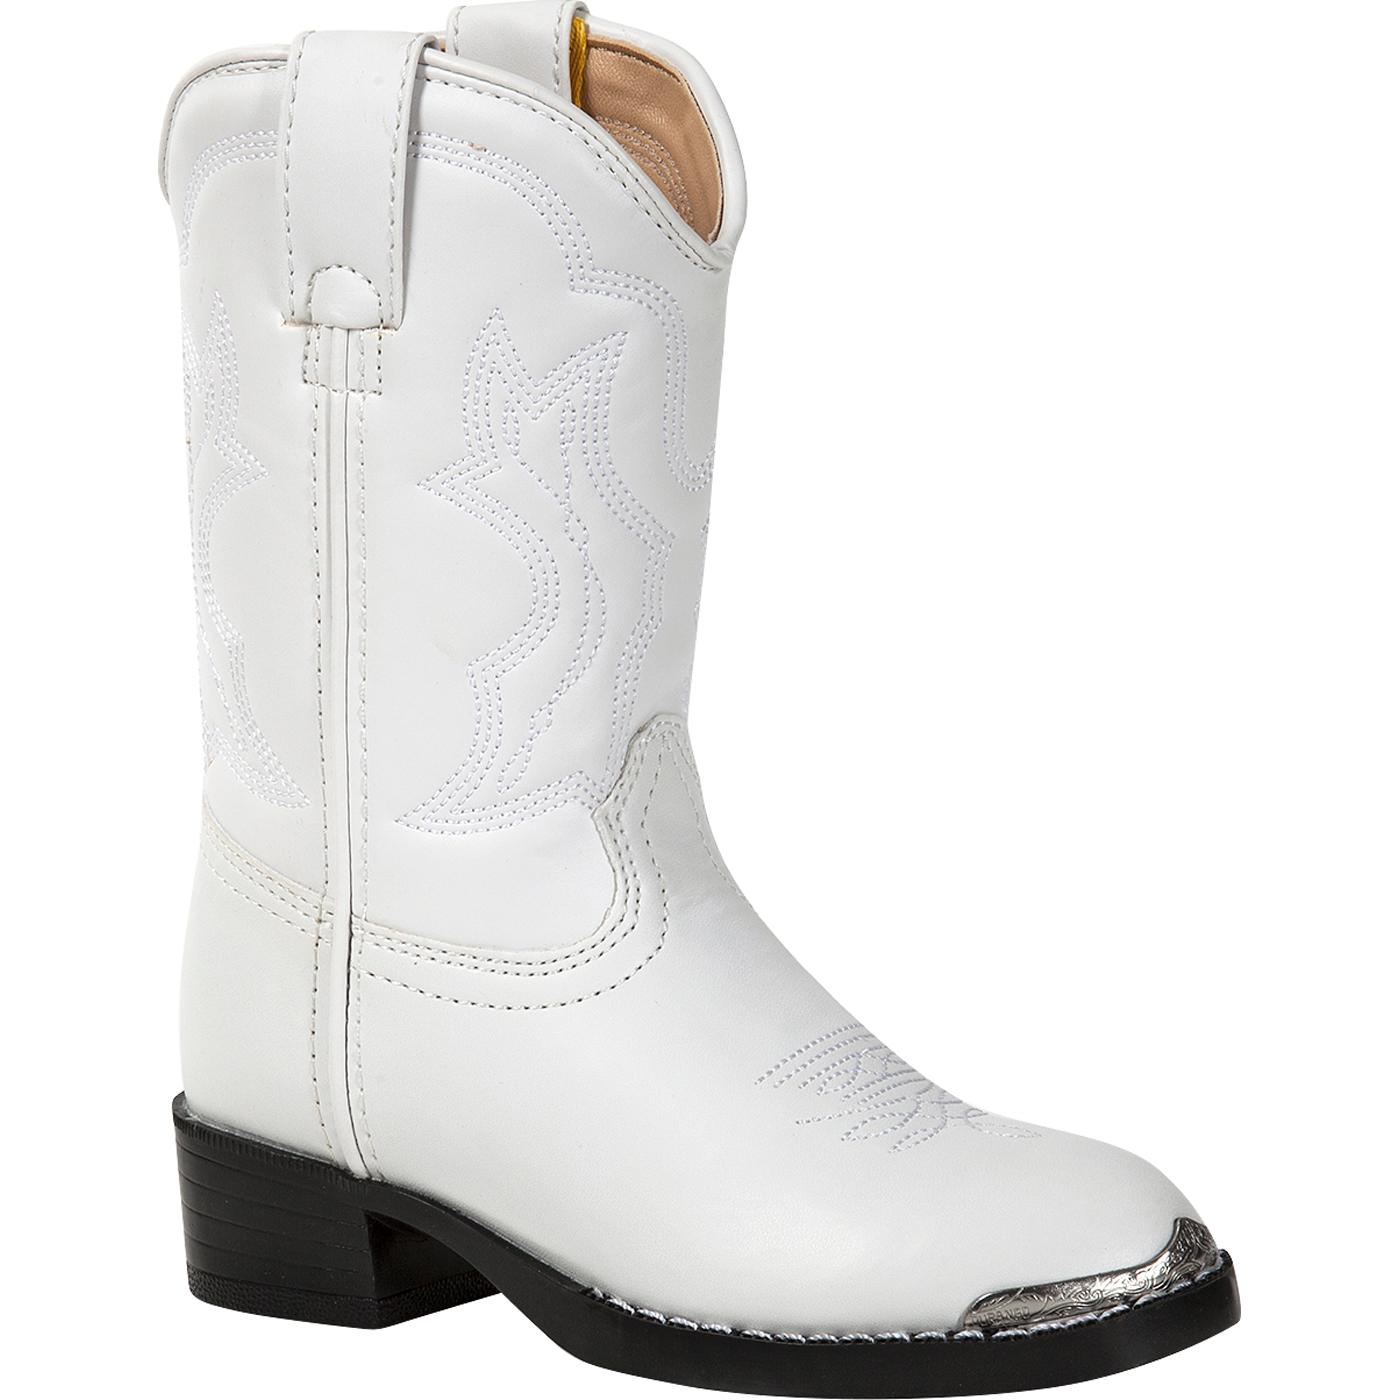 31f2eb19dc Botas vaqueras blancas para niños pequeños DurangoBotas vaqueras blancas  para niños pequeños Durango